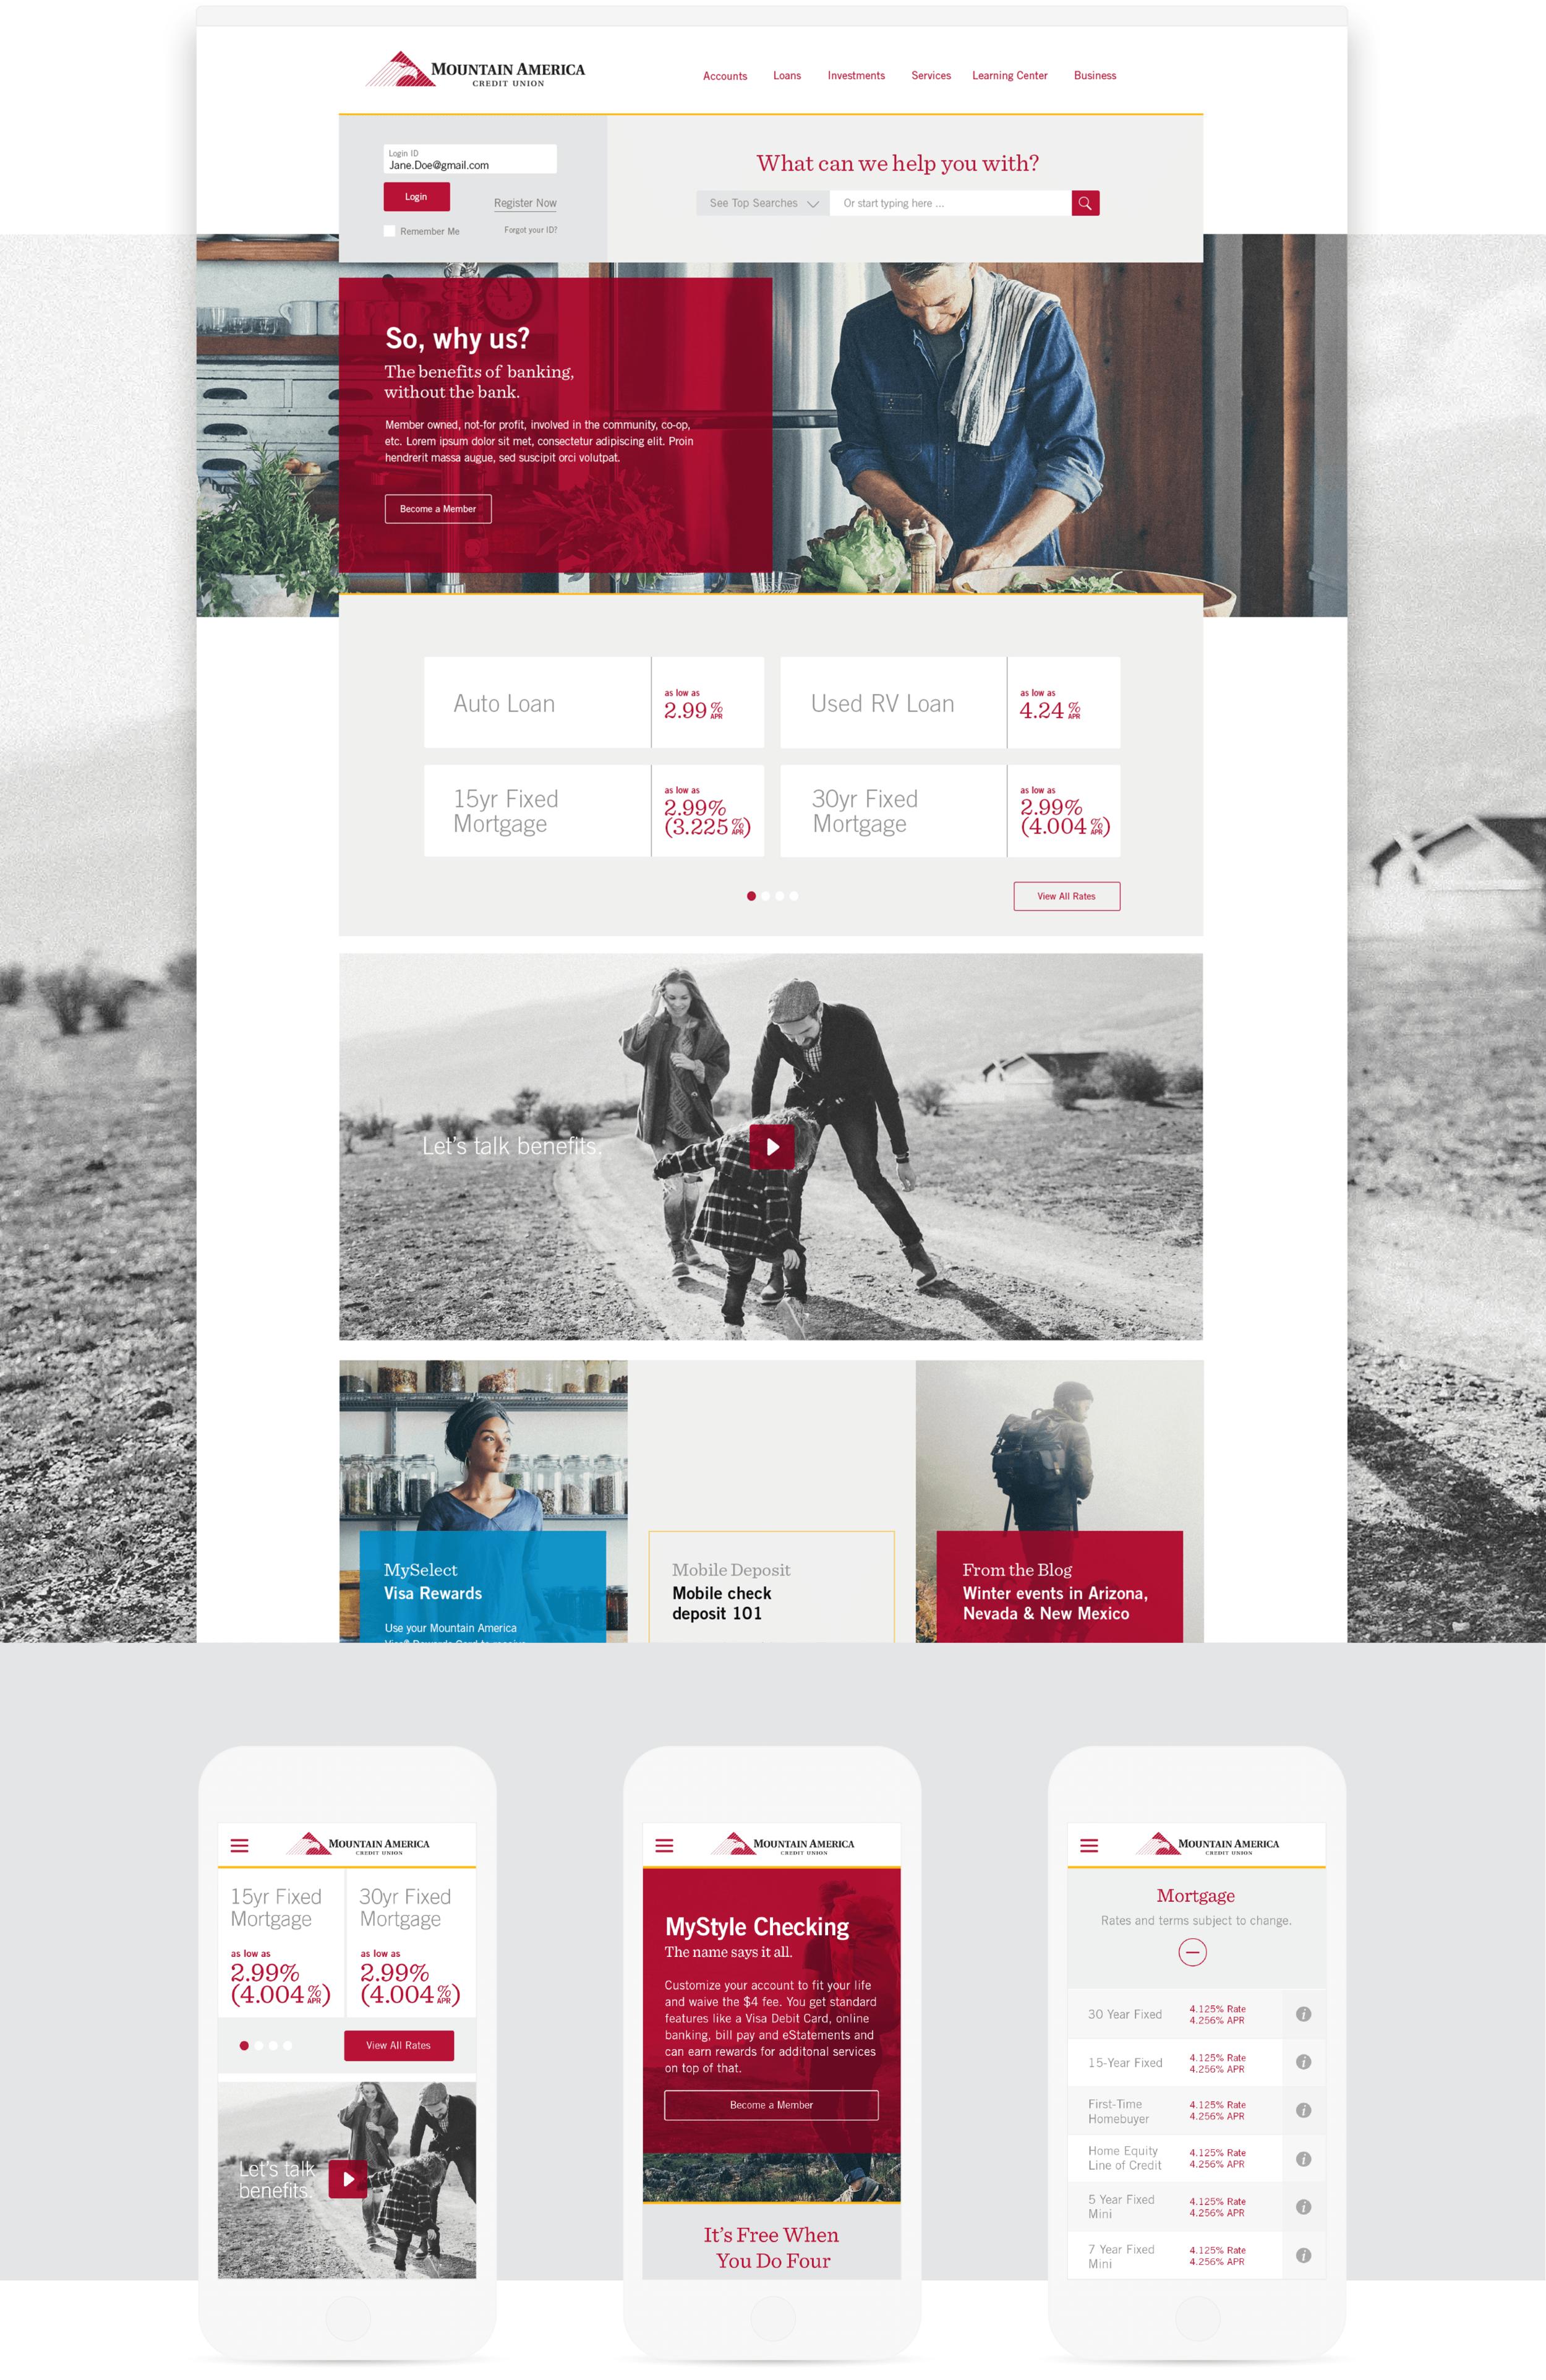 MACU Landing Page and Mobile Display